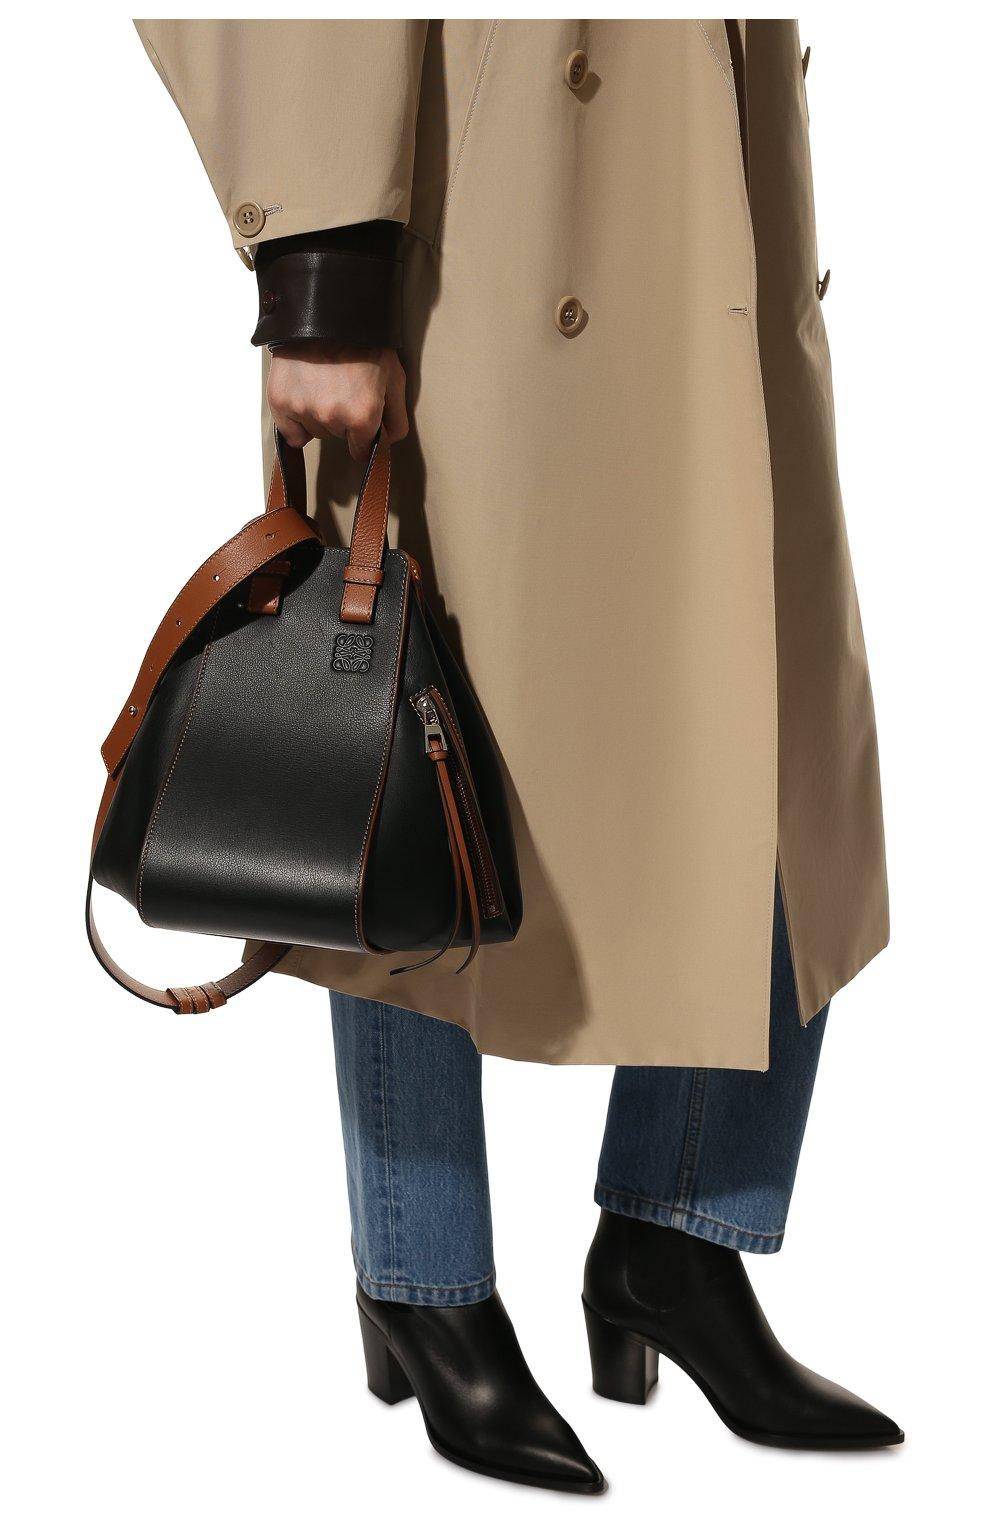 Женская сумка hammock small LOEWE черного цвета, арт. A538S35X04   Фото 2 (Сумки-технические: Сумки через плечо, Сумки top-handle; Материал: Натуральная кожа; Ремень/цепочка: На ремешке; Размер: small)